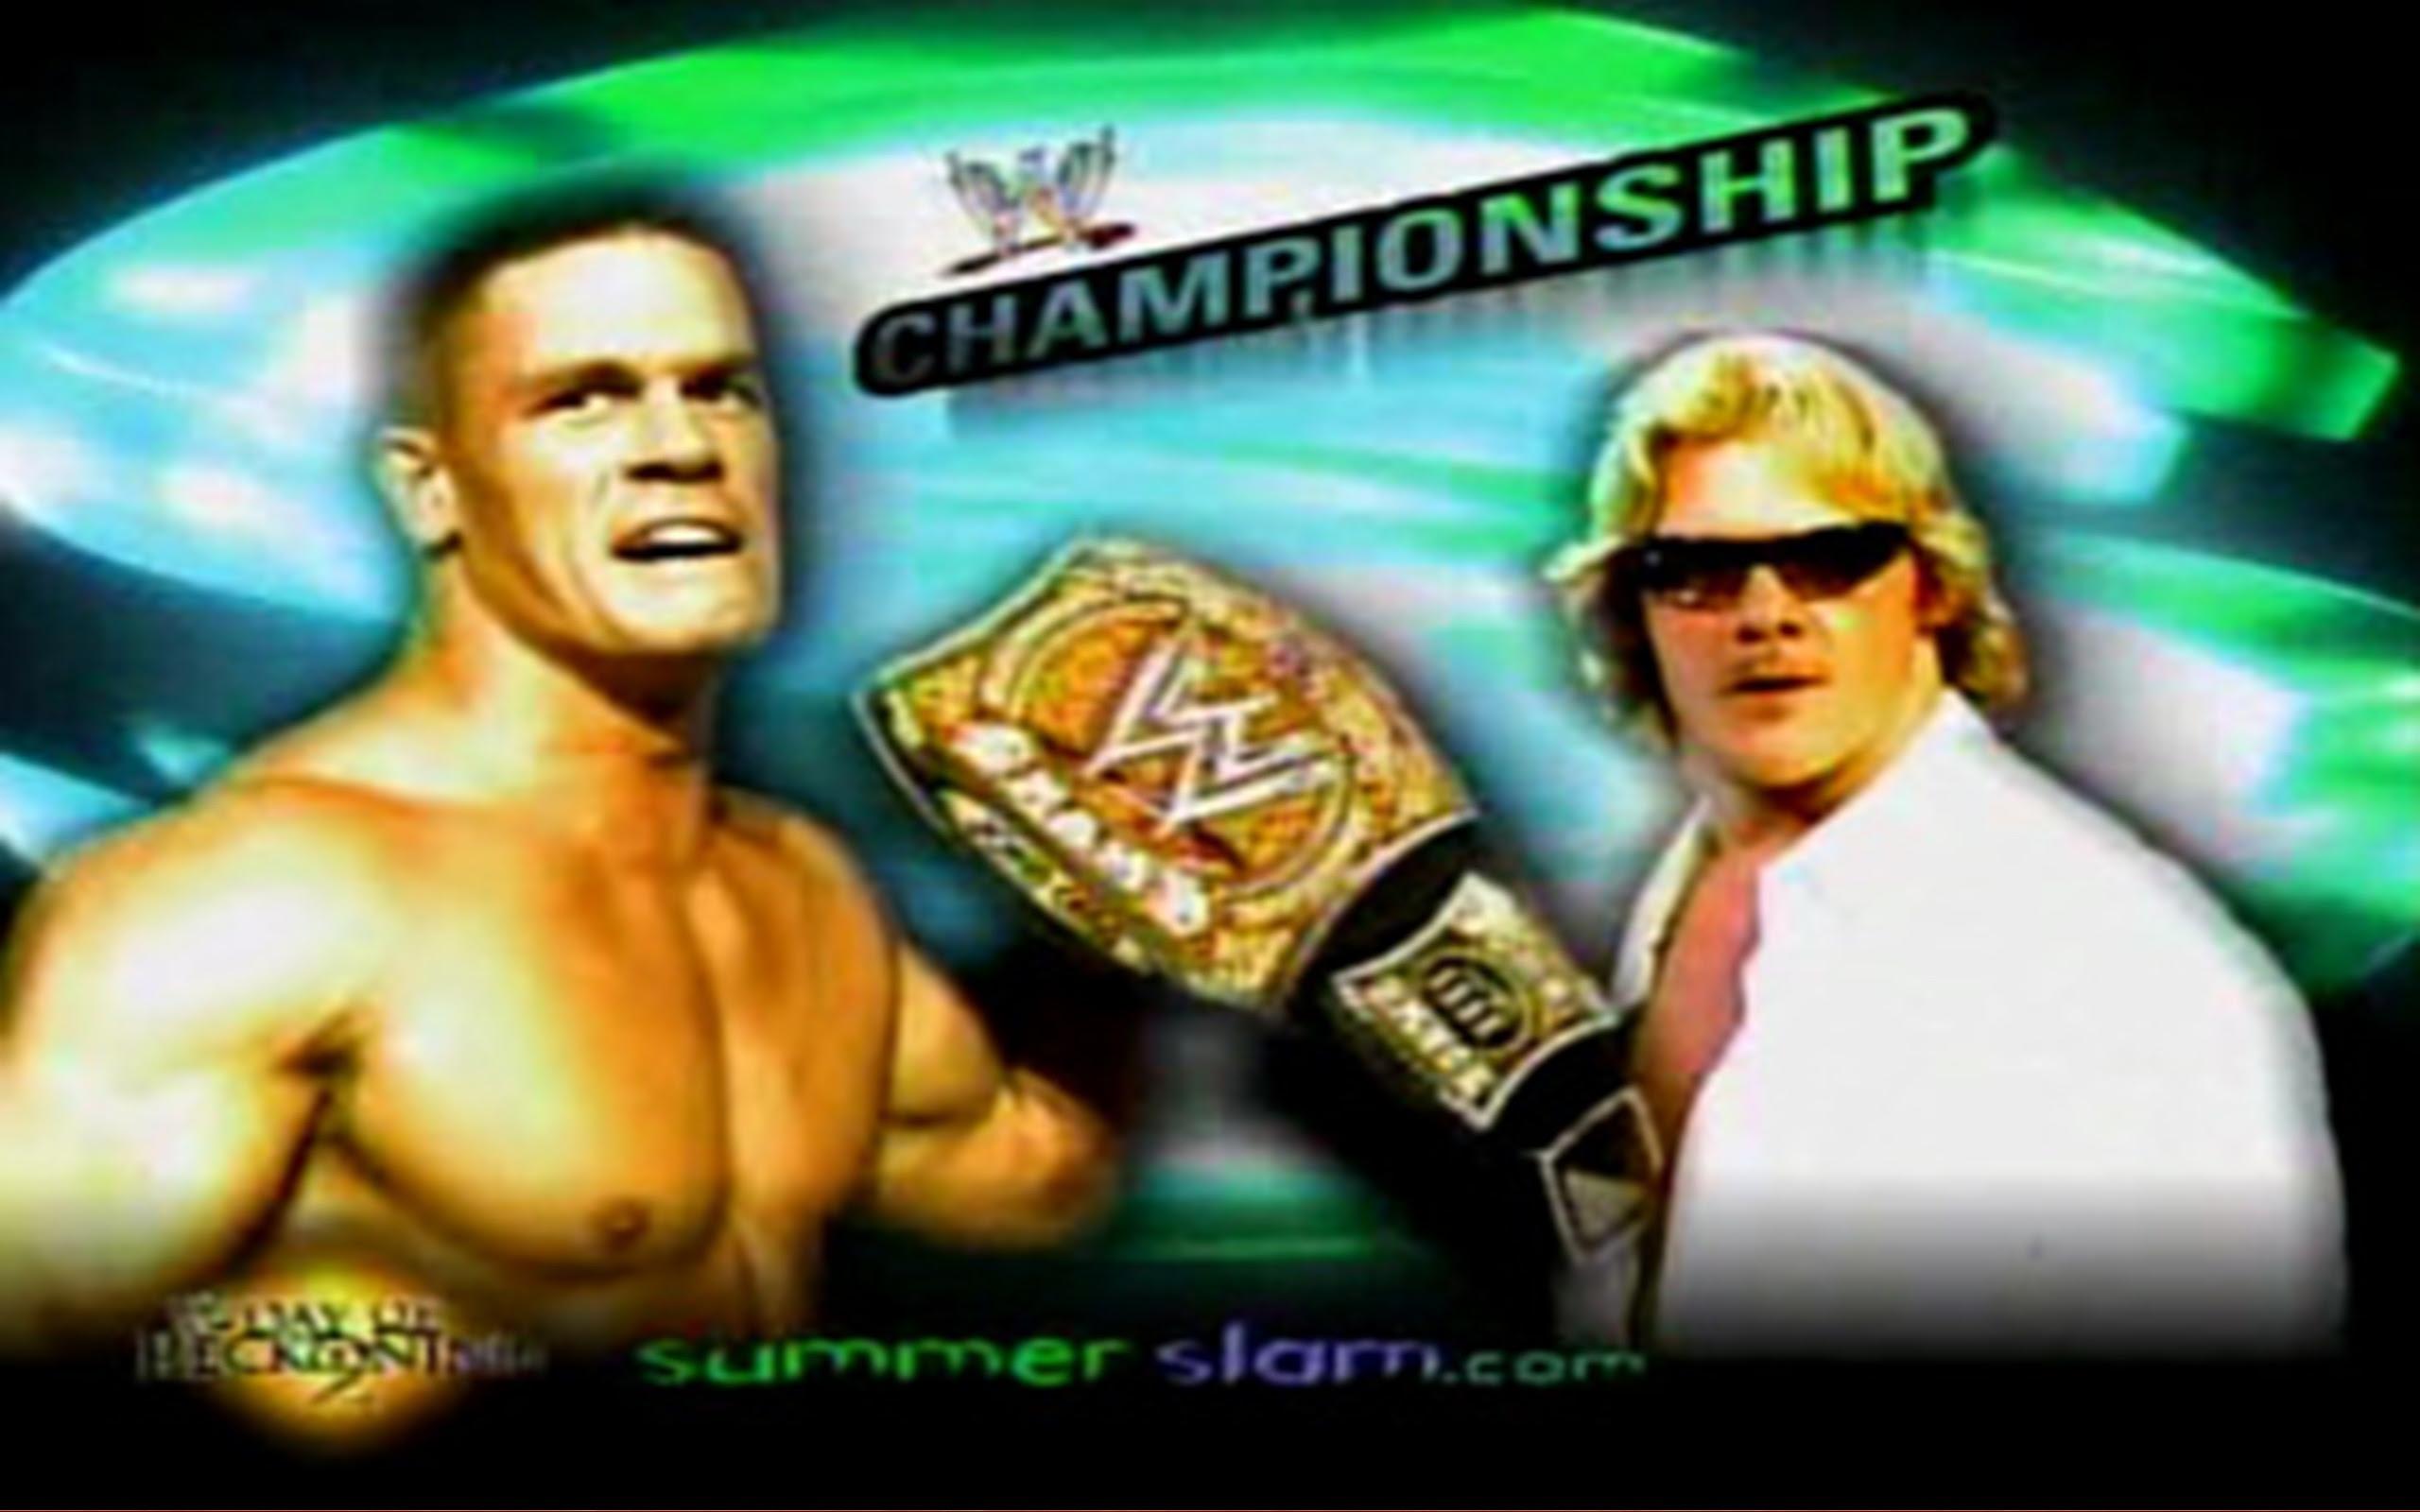 WWE SummerSlam 2005 - Raport